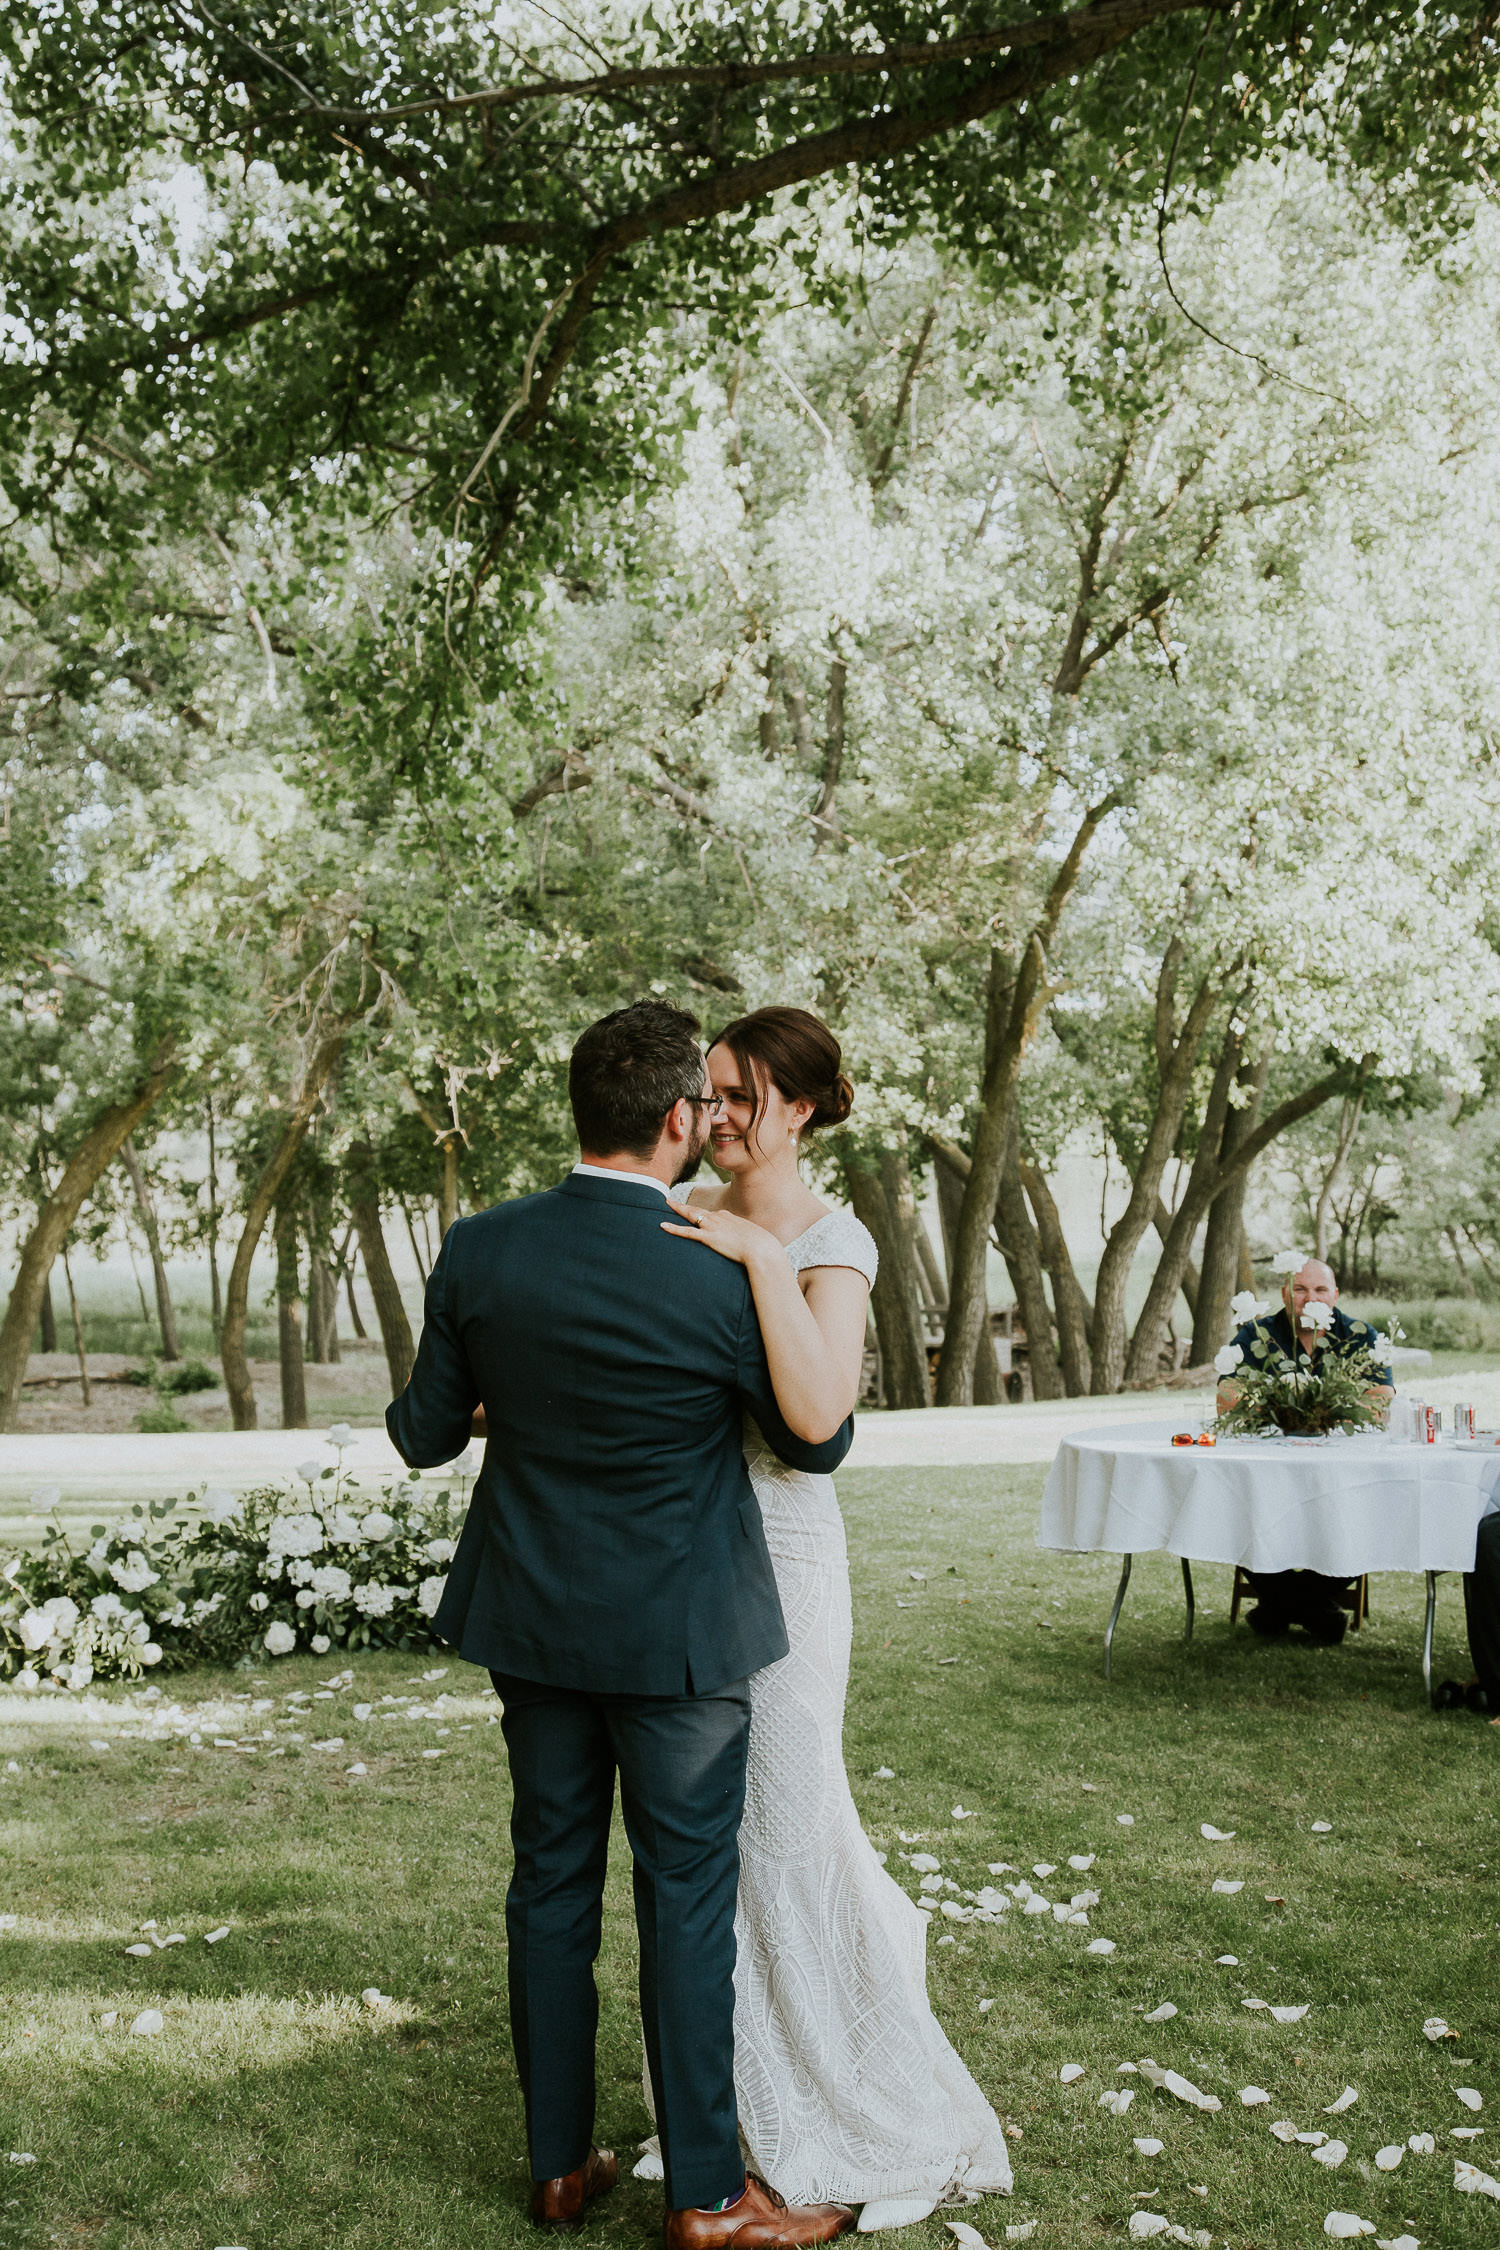 summer-backyard-wedding-in-alberta-sarah-pukin-0178